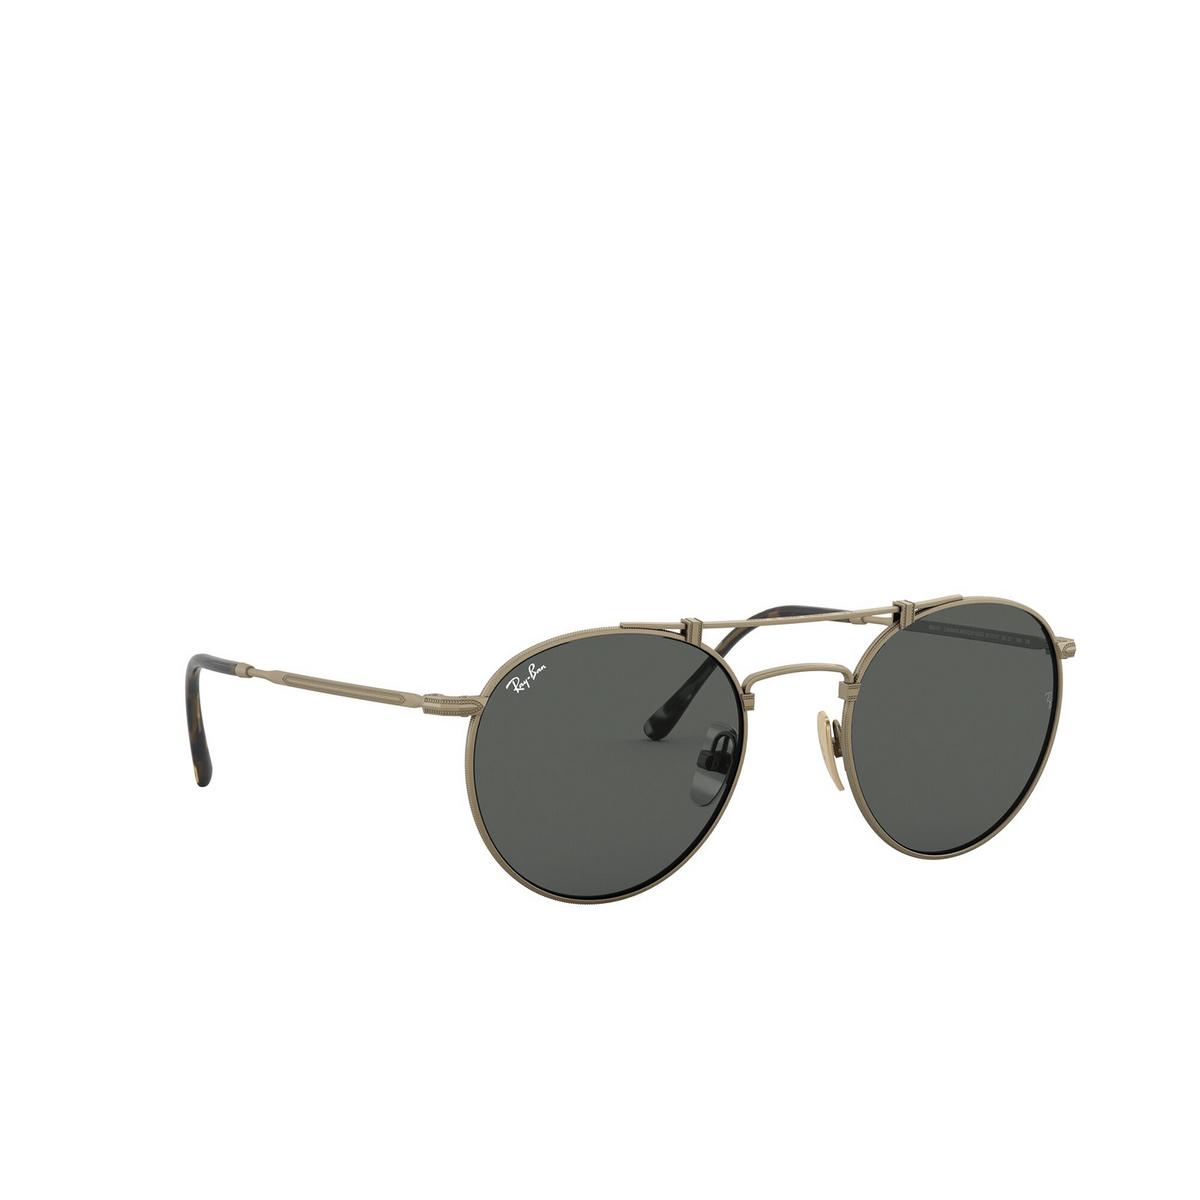 Ray-Ban® Round Sunglasses: Titanium RB8147 color Demi Gloss Antique Arista 913757 - three-quarters view.